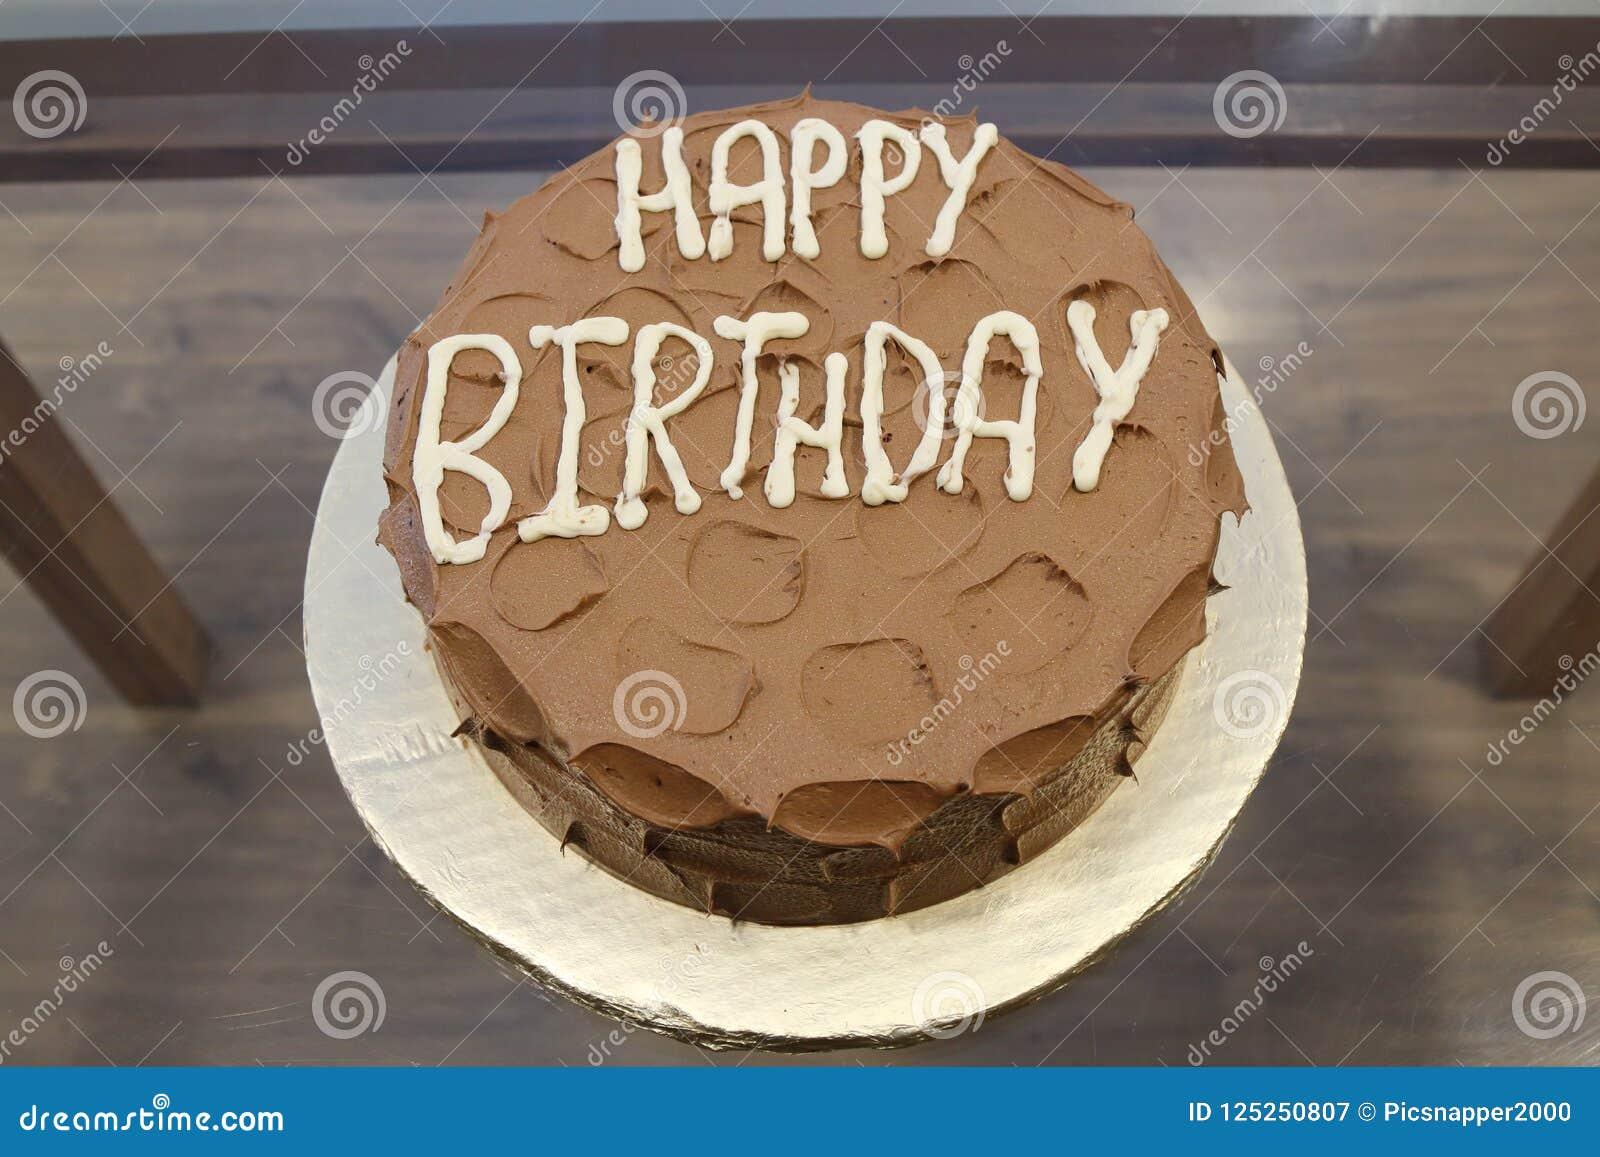 Awe Inspiring Chocolate Cake In Medium Brown Happy Birthday Text In White Stock Personalised Birthday Cards Beptaeletsinfo